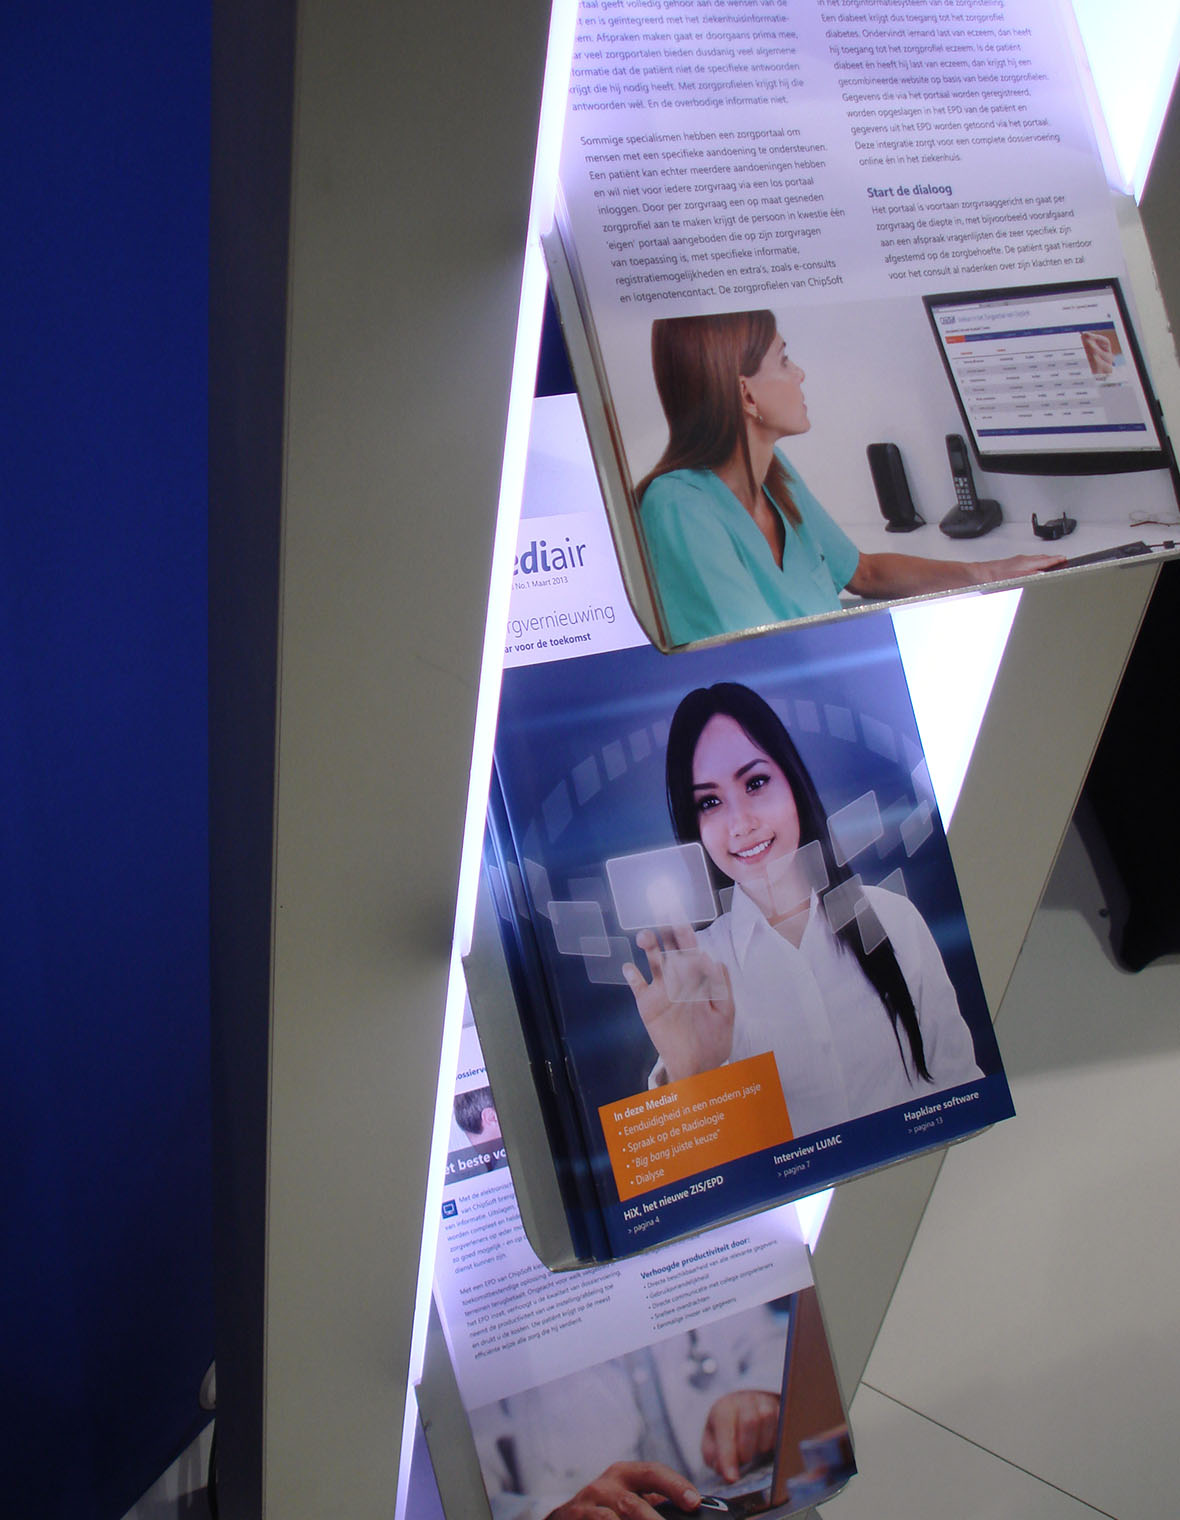 chipsoft brochure magazine drukwerk grafisch ontwerp mediair verzameling compilatie